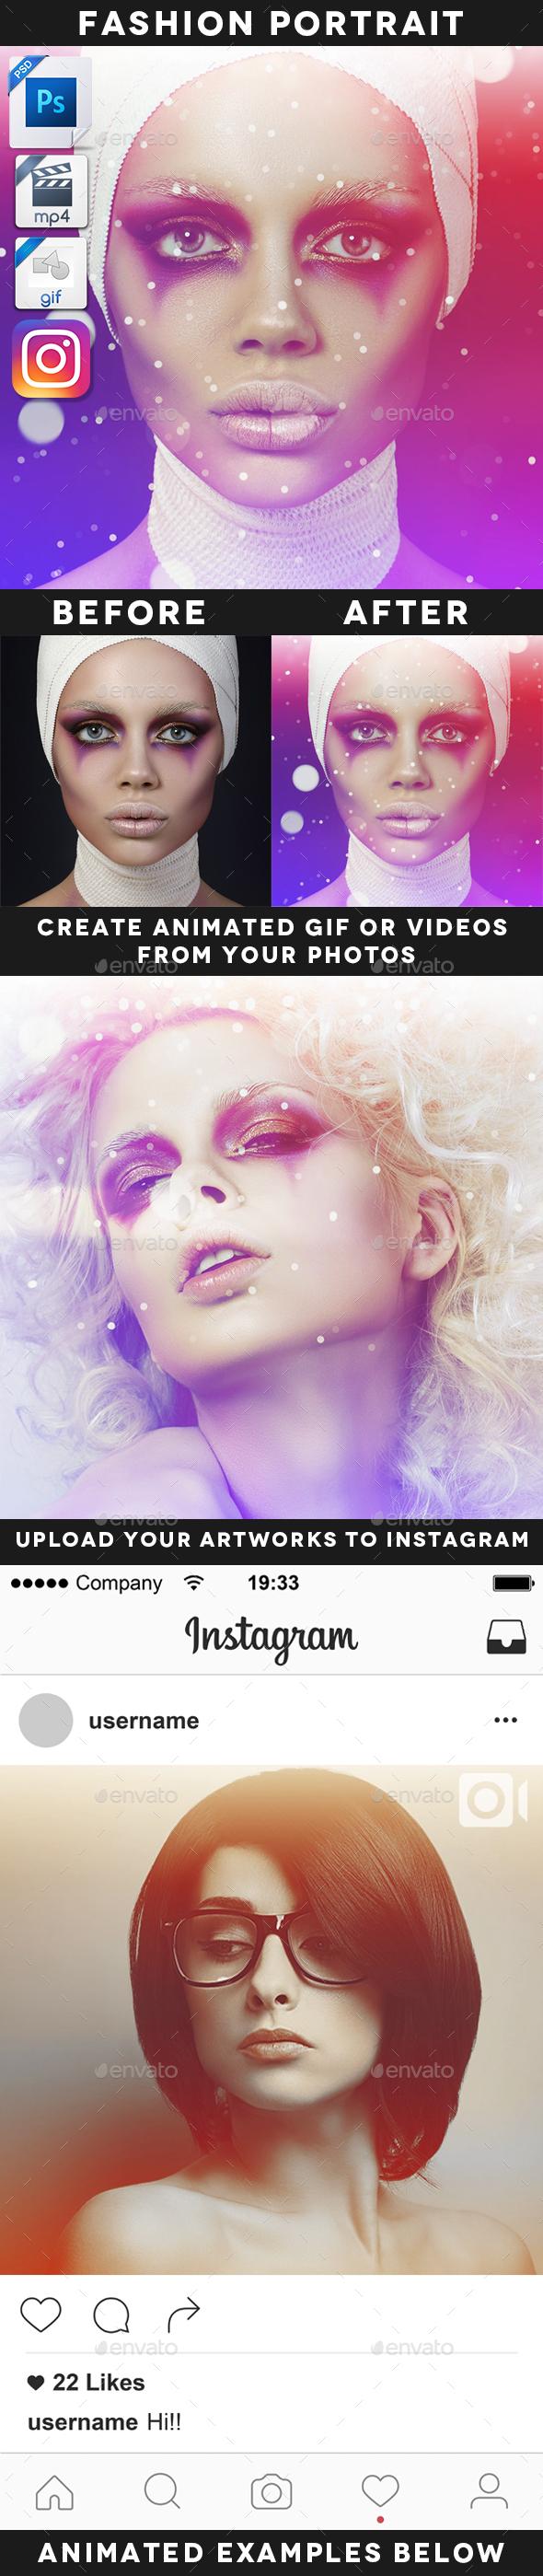 Animated Fashion Portrait Template - Artistic Photo Templates